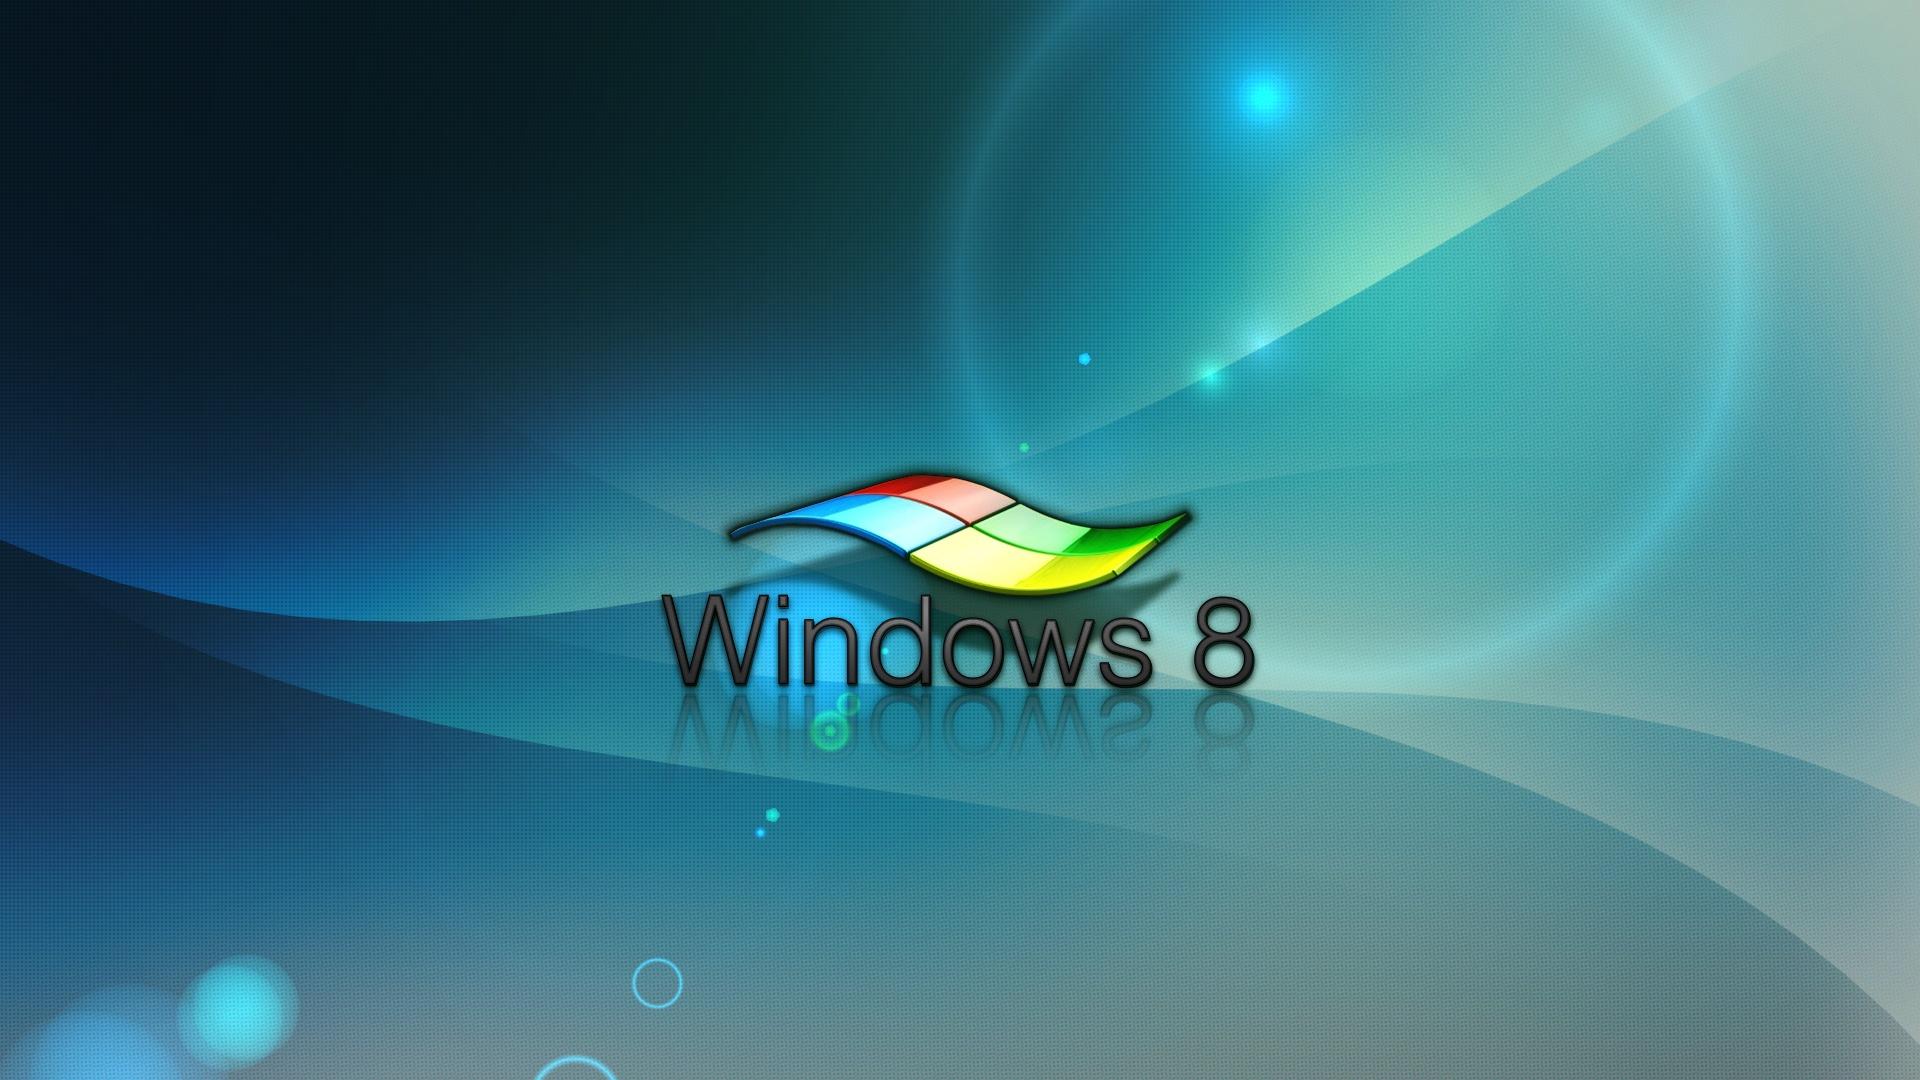 Los Efectos 3D De Windows 8 Fondos De Pantalla 1920x1080 Full HD Fondos De